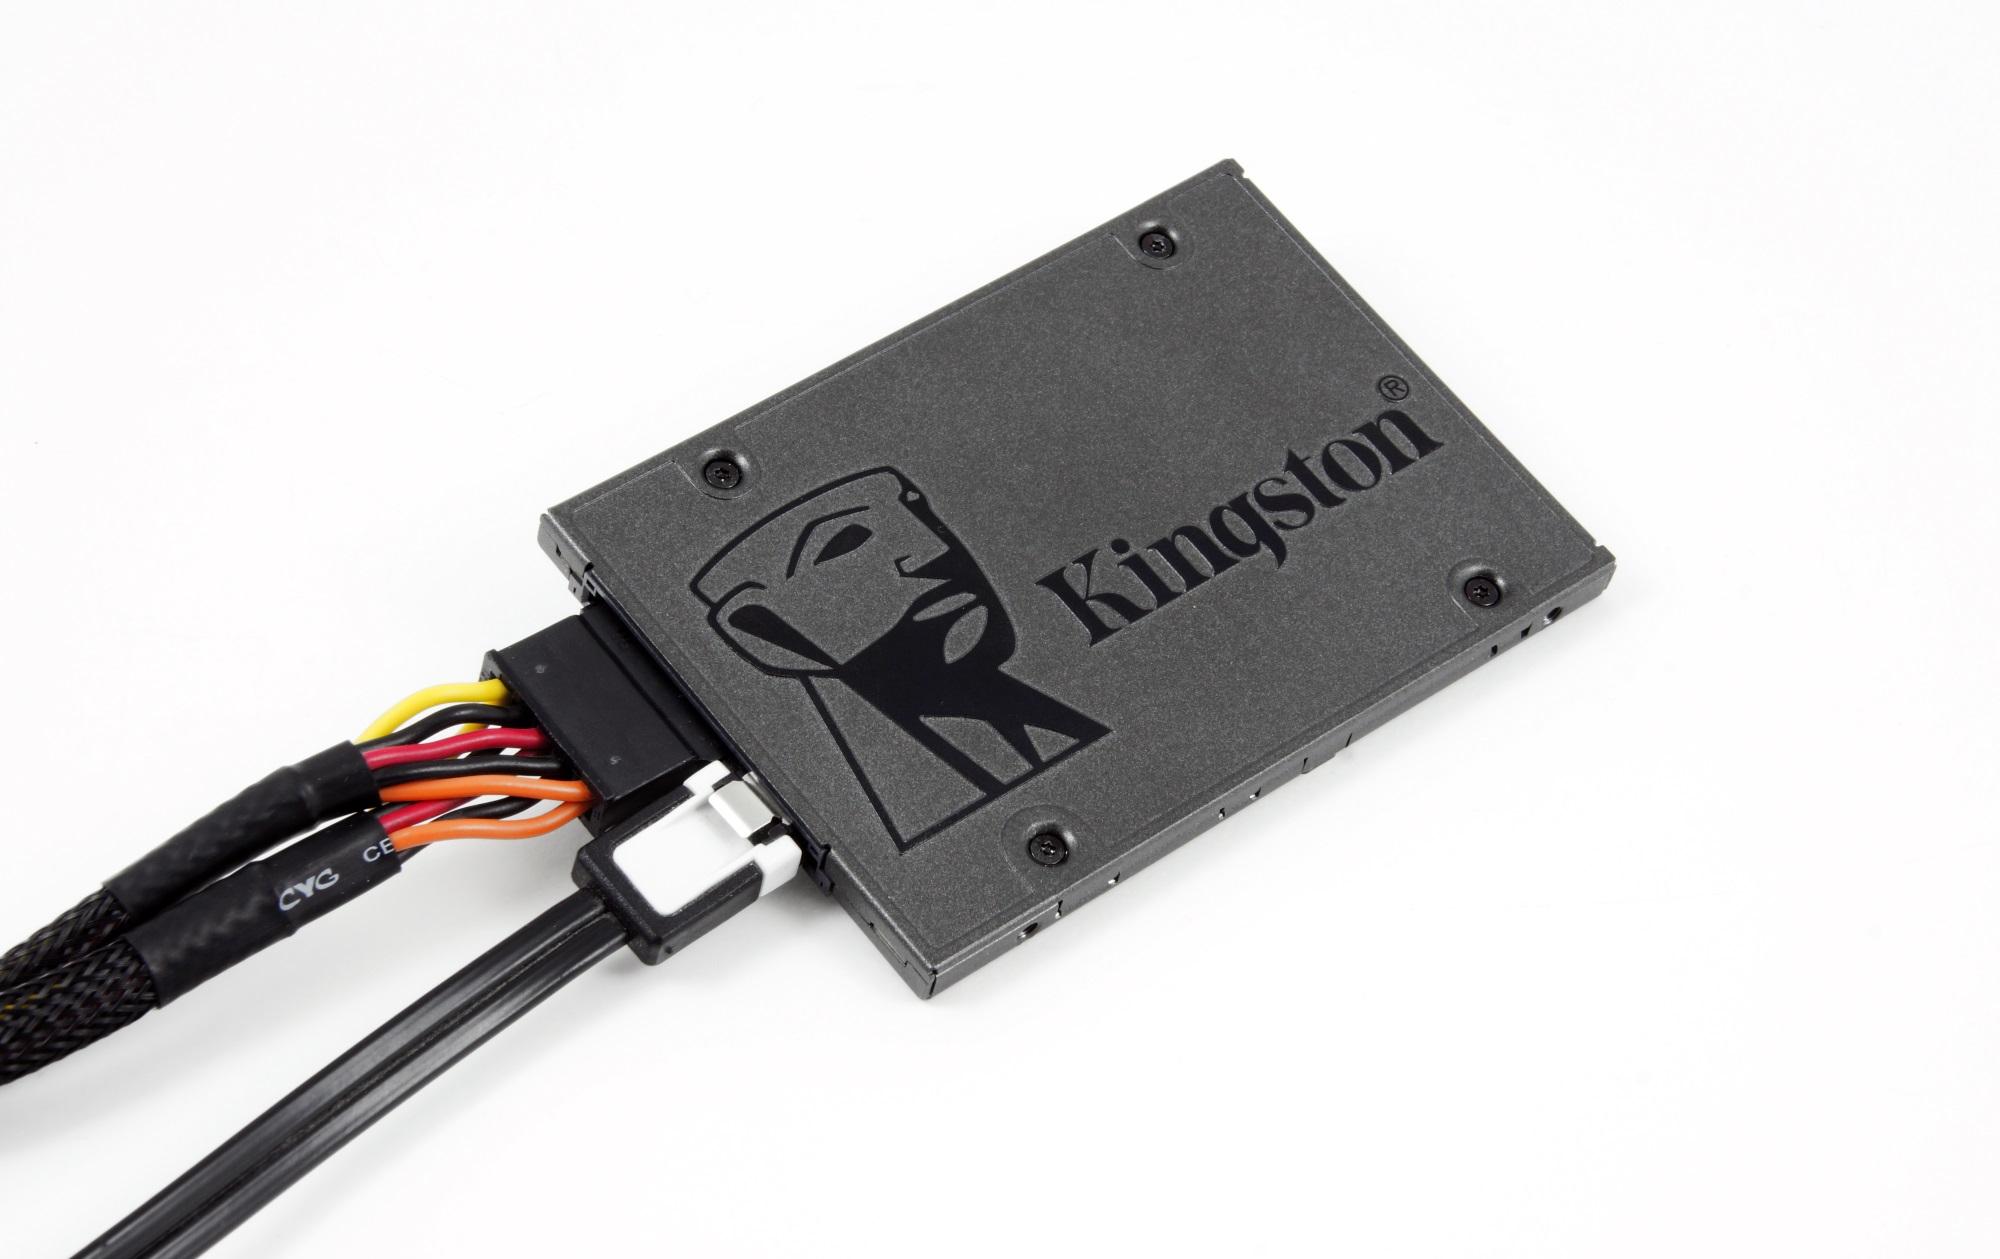 Обзор и тестирование SSD 480-512 Гбайт: Corsair Neutron GTX, Plextor M5 Pro, Samsung 840 Pro и Toshiba Q-Series Pro (страница 7)